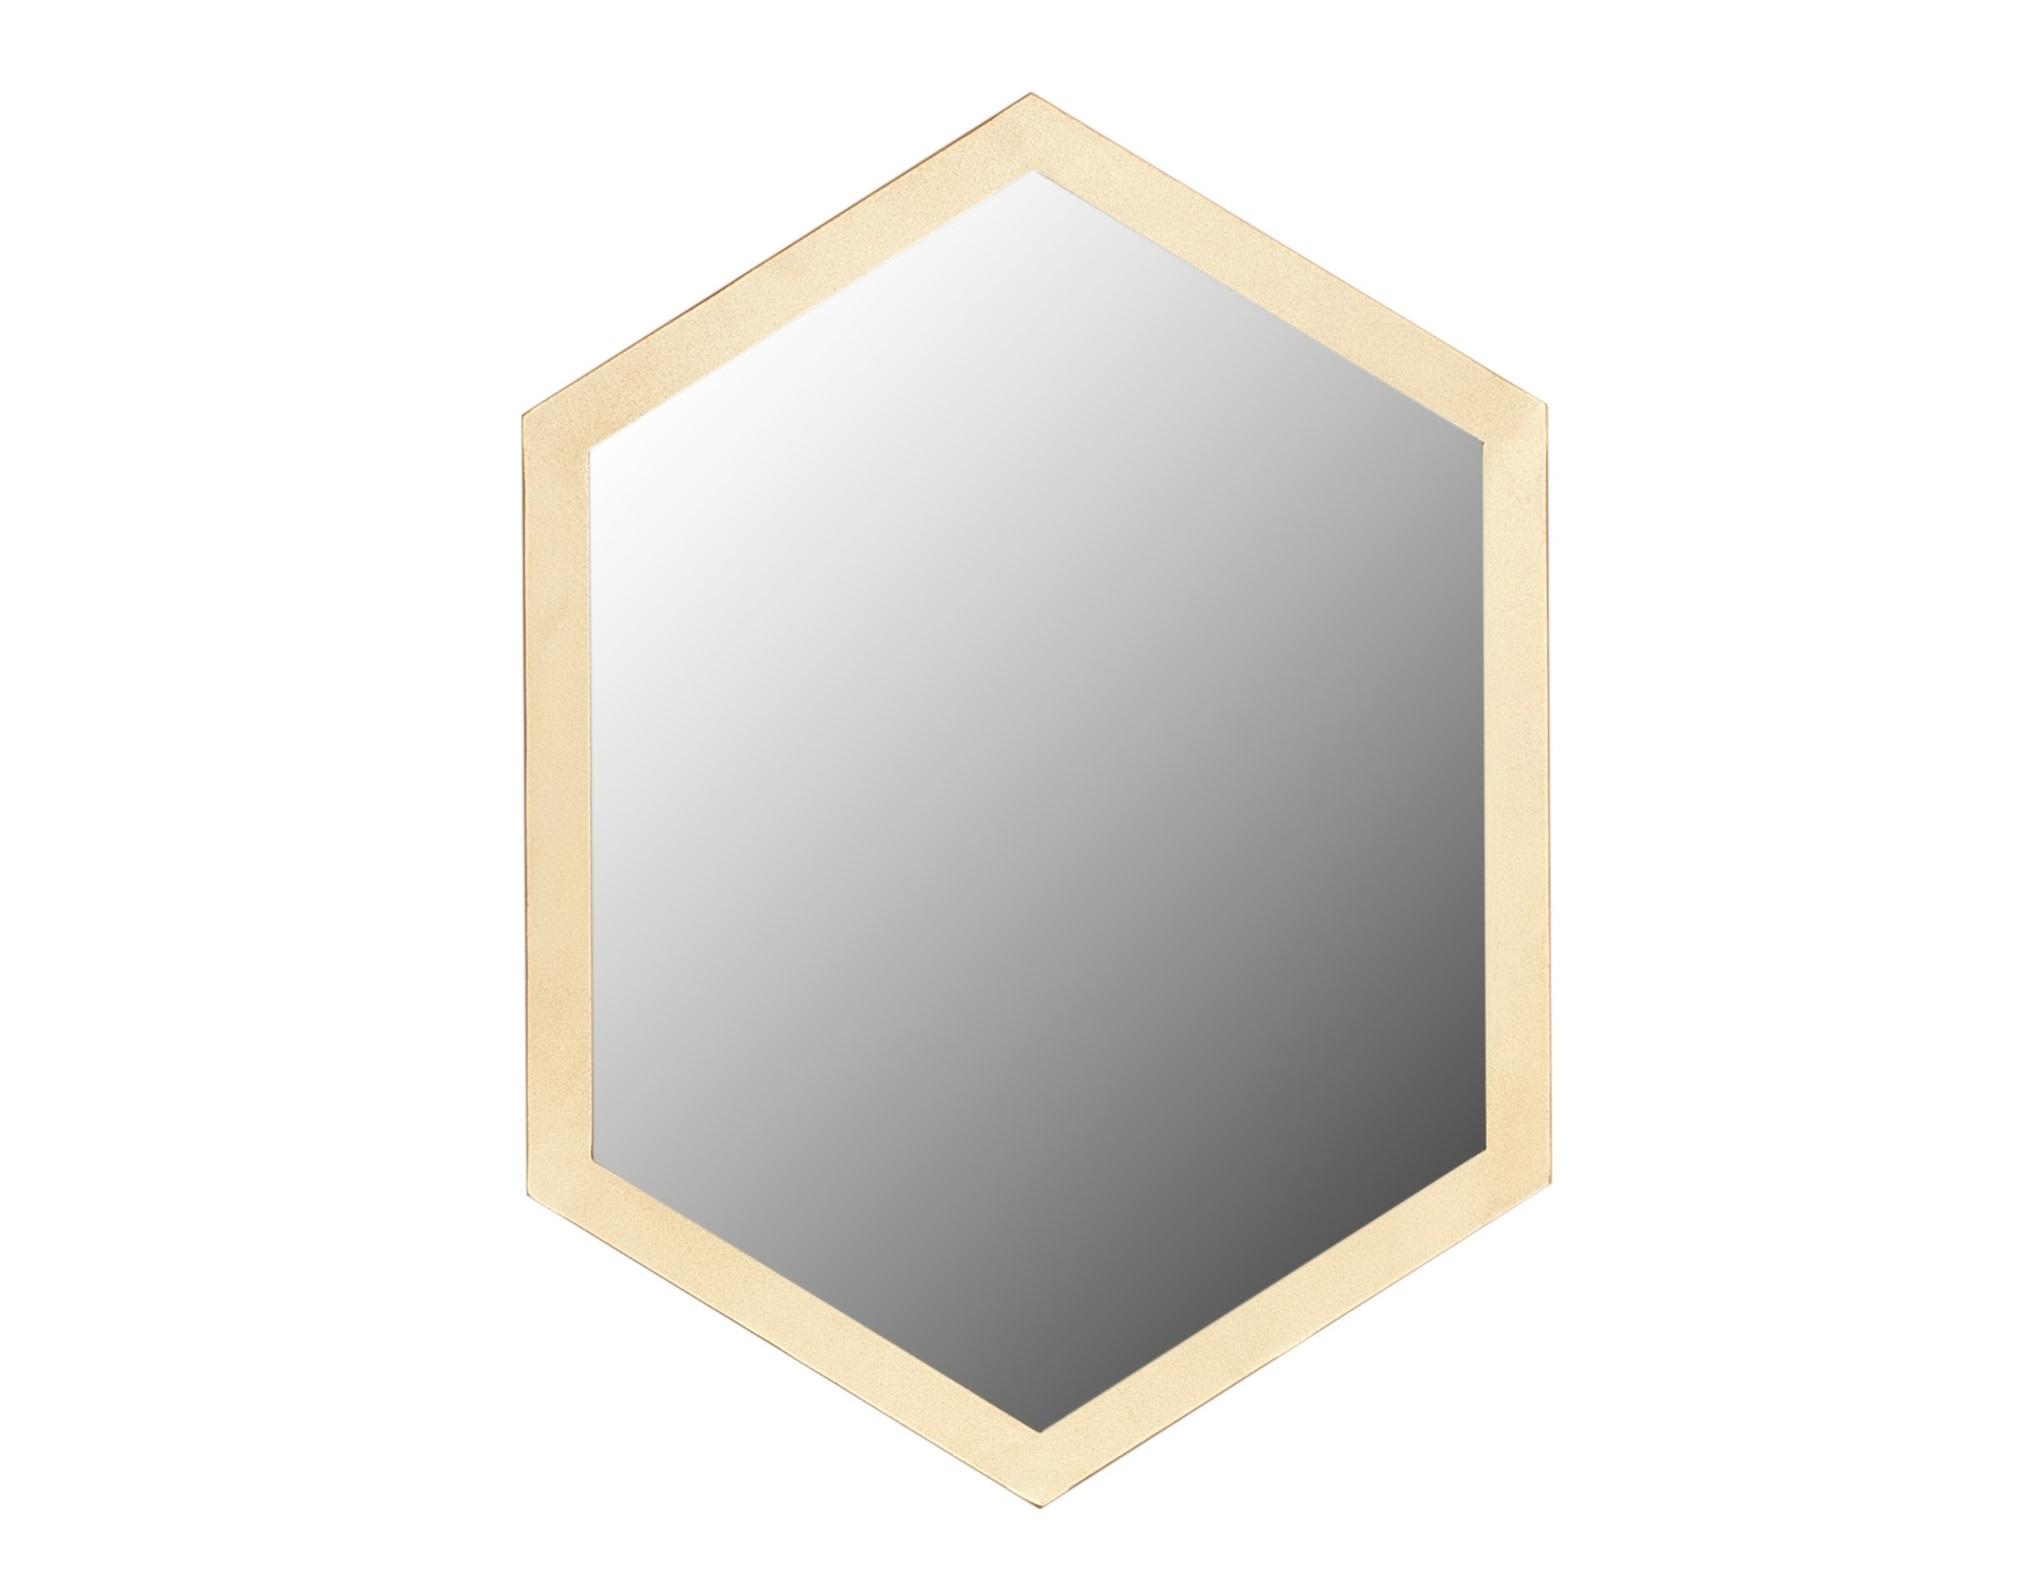 Зеркало (for miss) золотой 51.0x70.0x2.0 см. фото